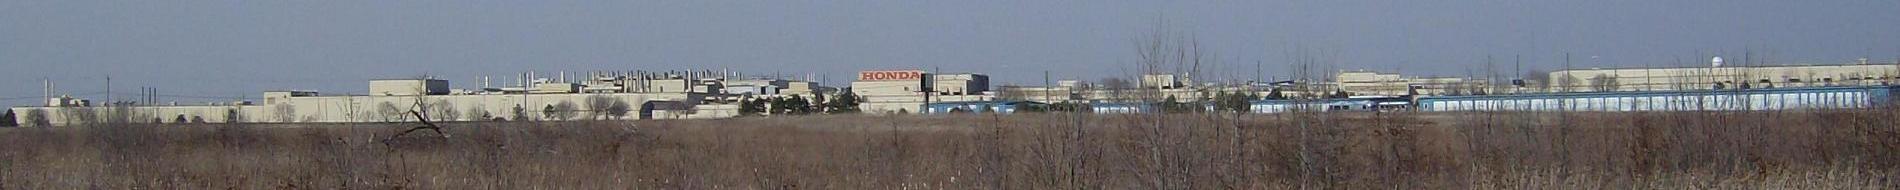 Honda_of_America_Marysville_cropped.jpg